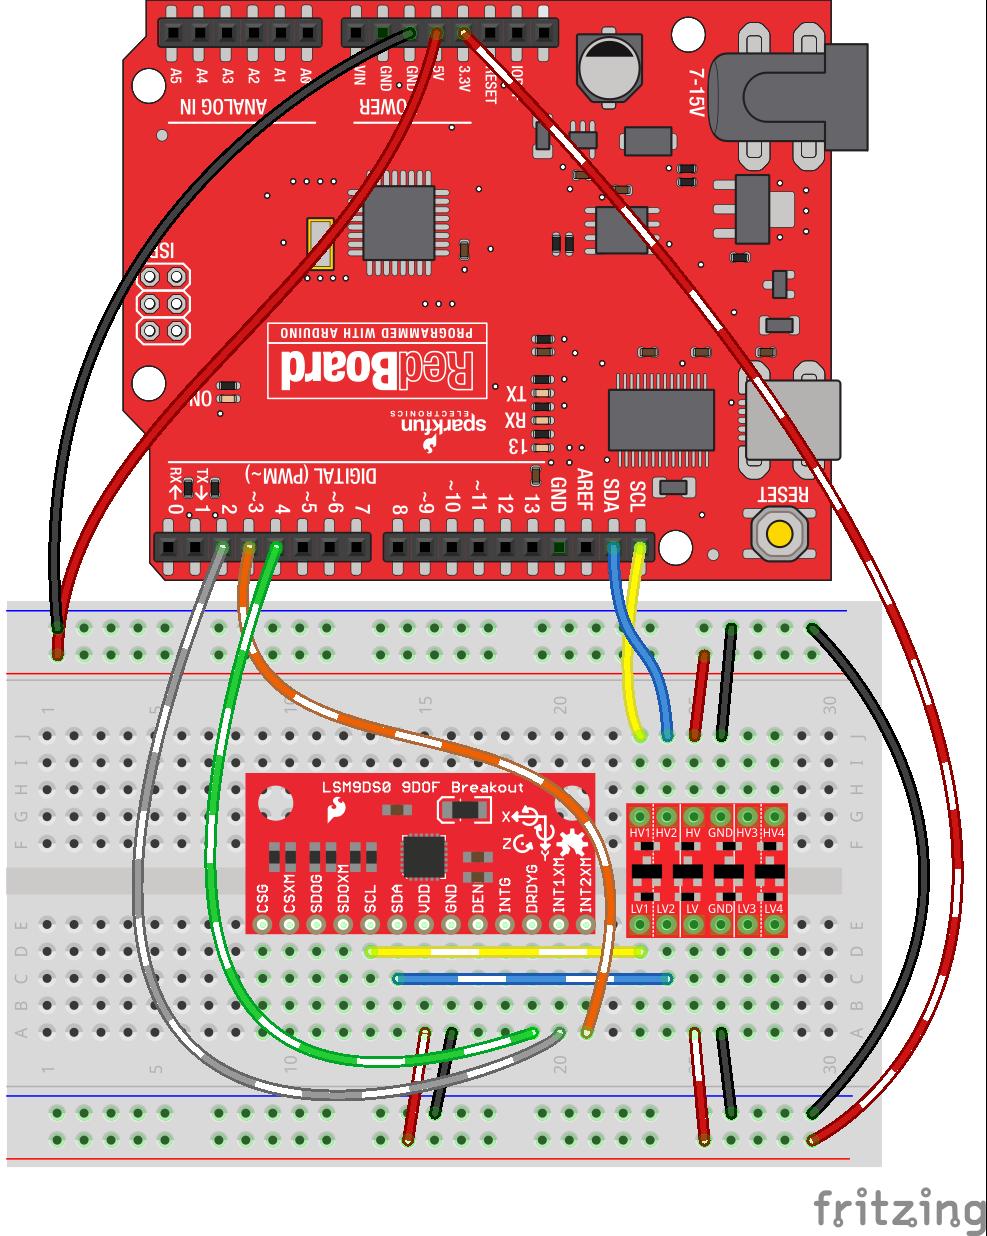 rv power hookup electric mx tlof the drdyg int1xm and int2xm pins hereâ\u20ac™s the hookup diagram